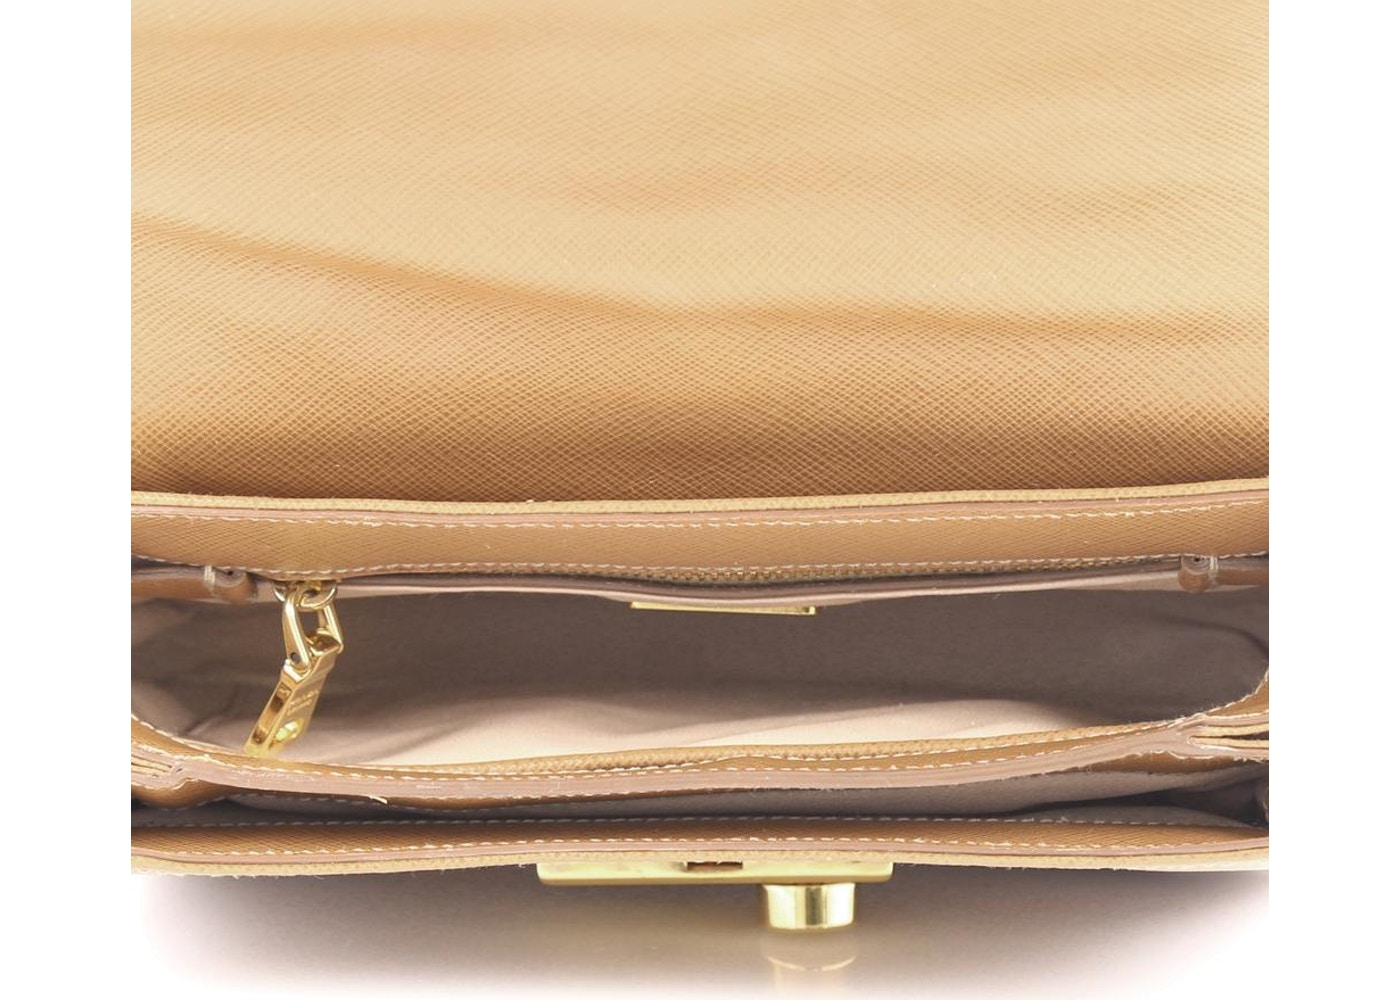 d826d8c66 Prada Sound Bag convertible Flap Vernice Saffiano Mini Light Brown